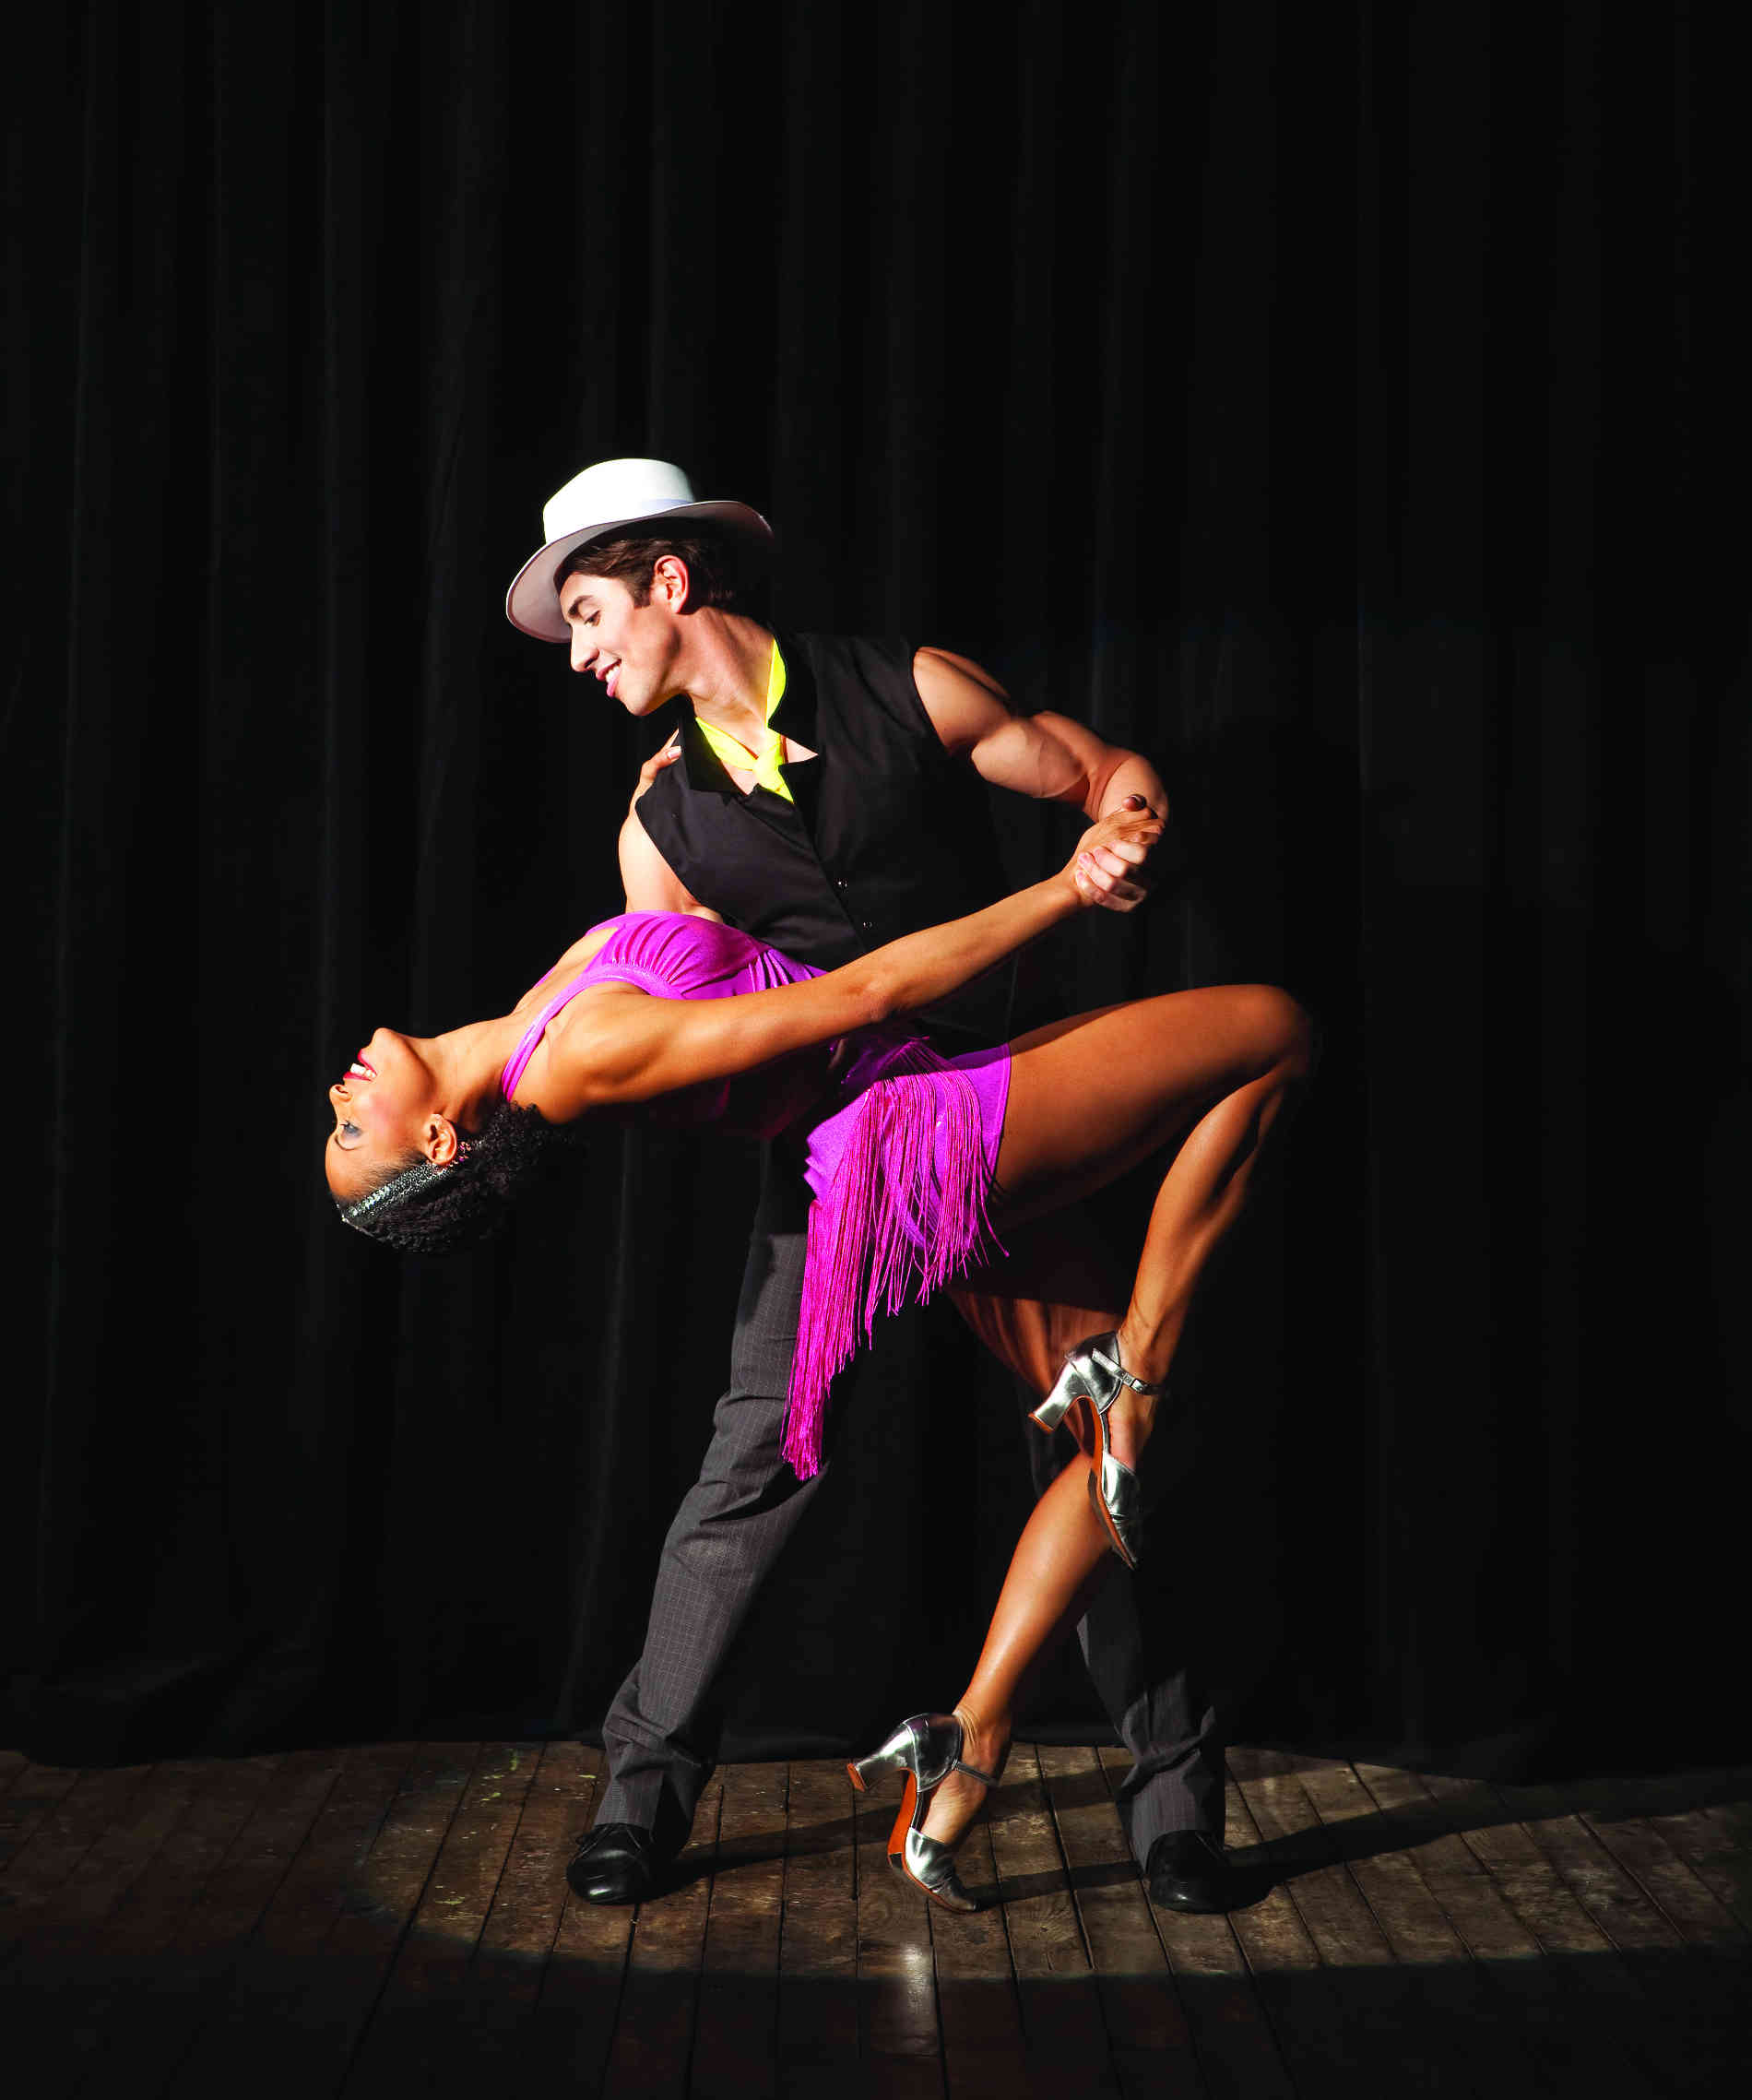 она картинки латино танец простудой видимо заразилась